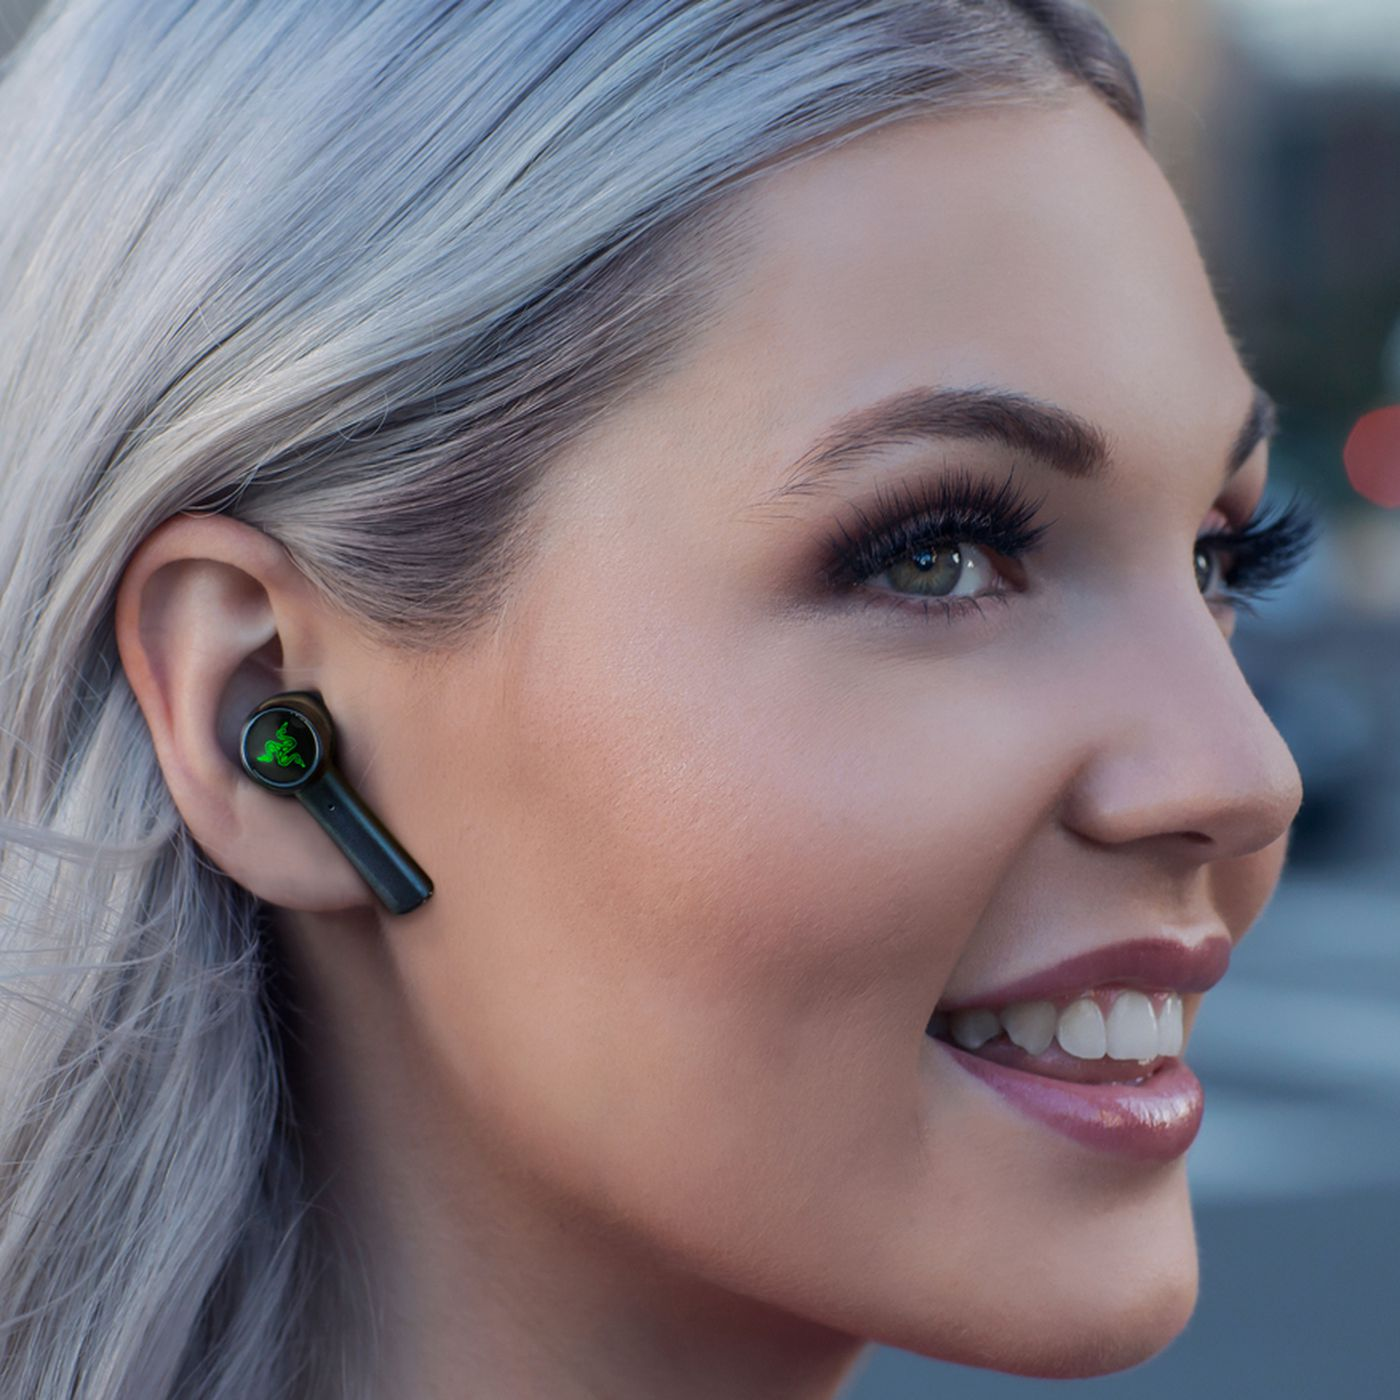 Razer S Hammerhead True Wireless Headphones Aim To Nix Audio Lag On Android The Verge